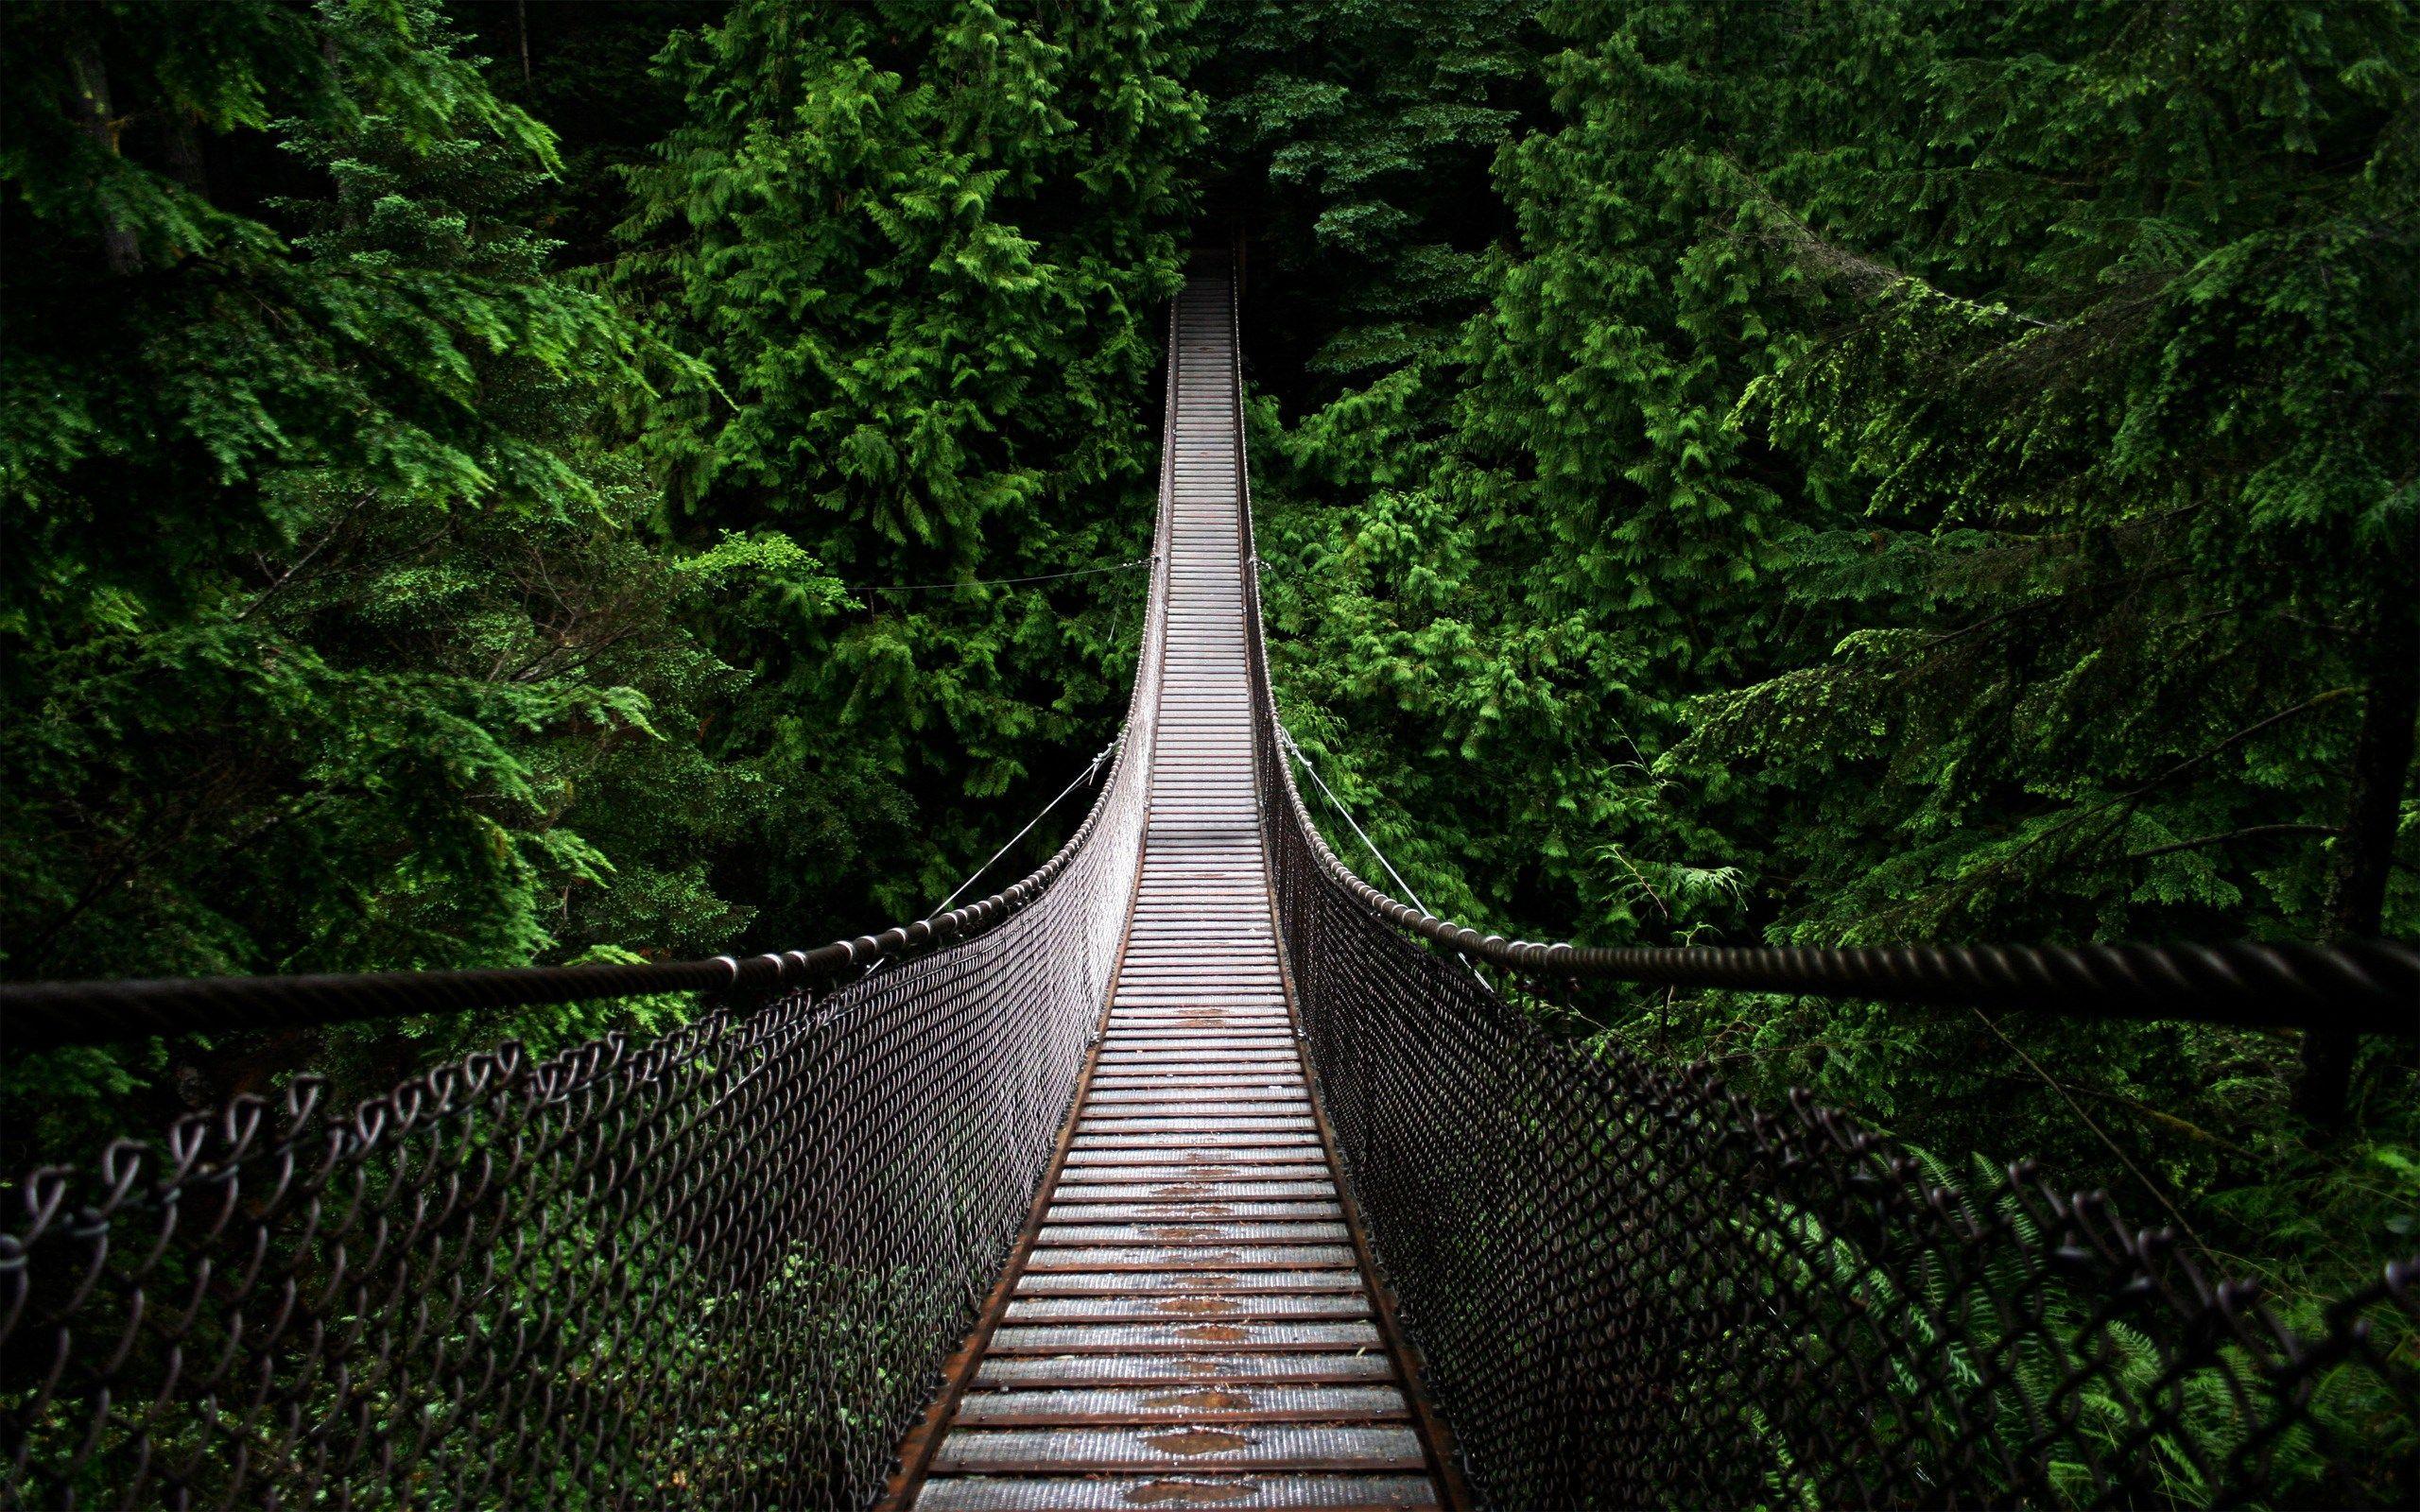 hd pine tree wallpaper Лесные обои, Фотографии, Мост